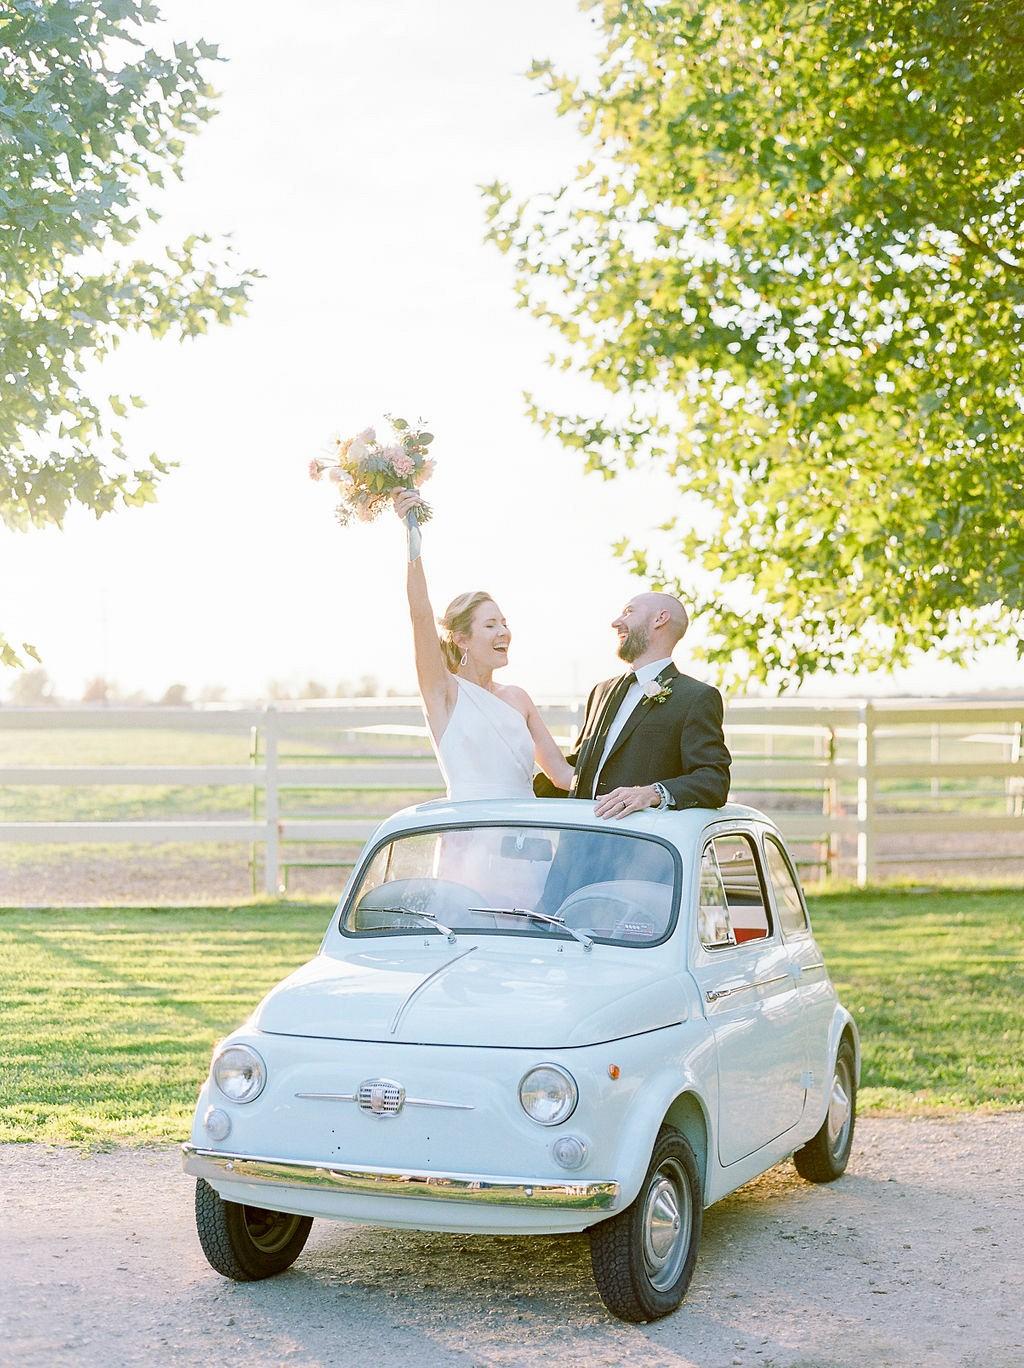 Bringing Italy to Idaho with a Cute Fiat 500!